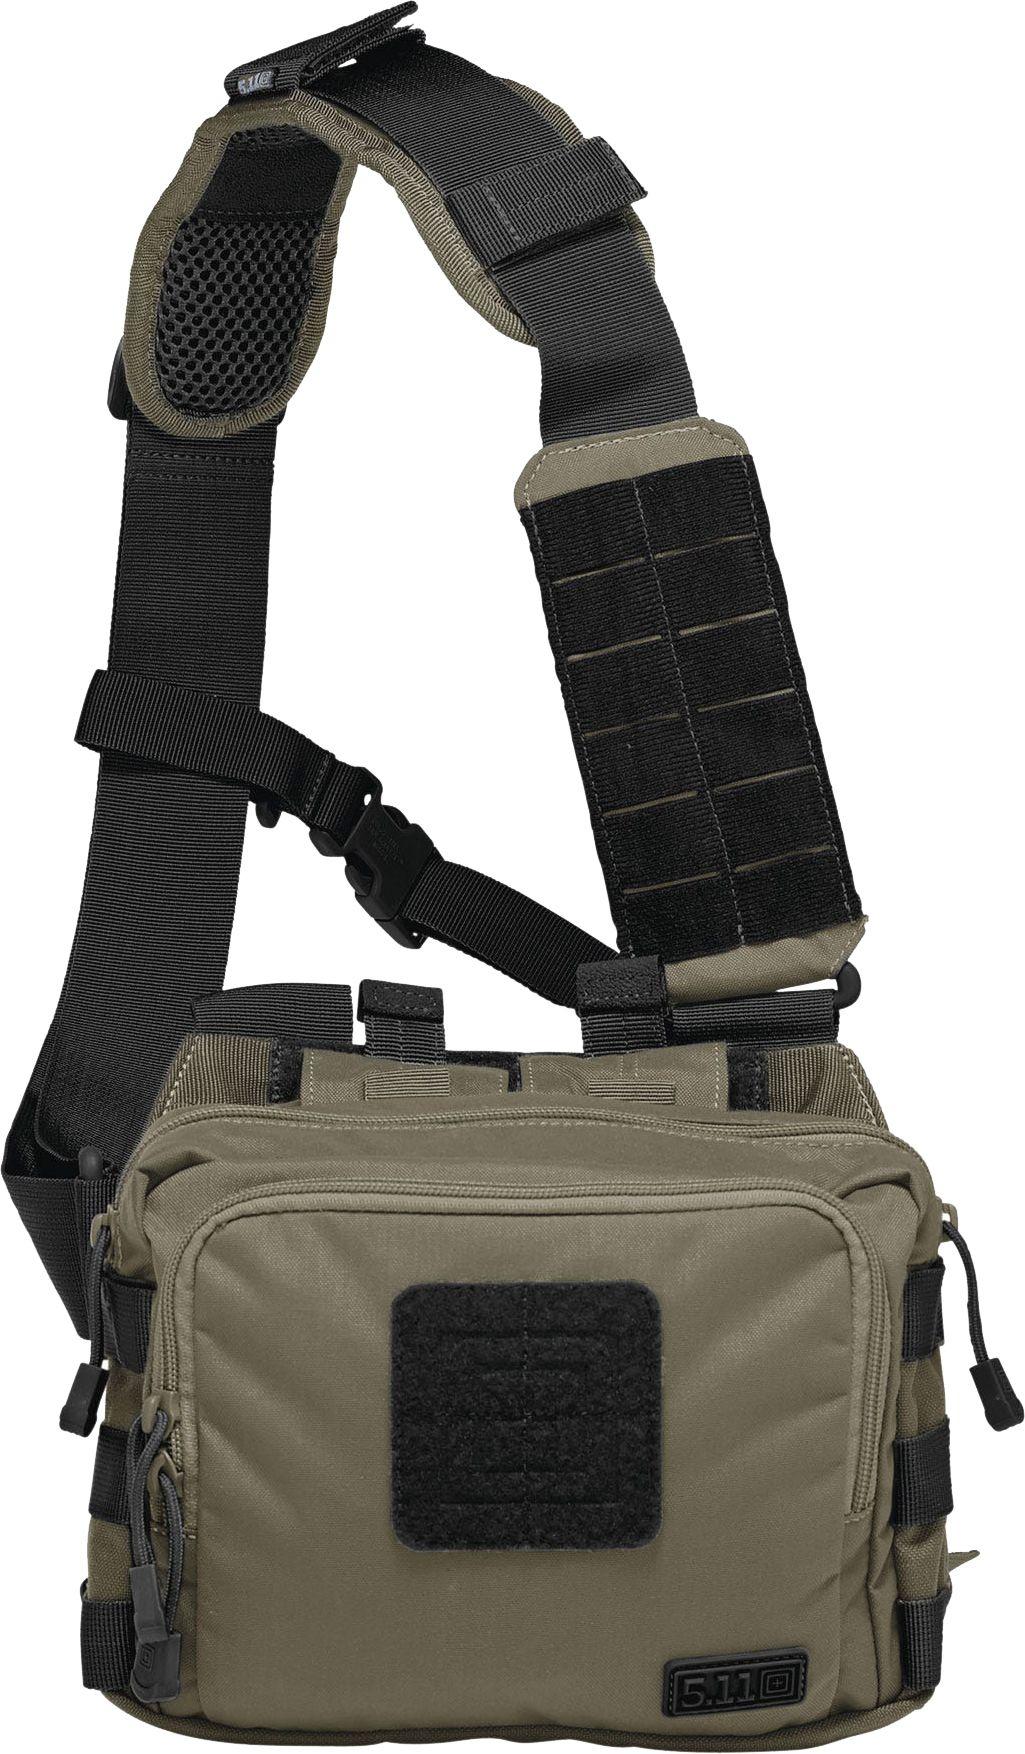 5.11 Tactical 2 Banger Gear Bag, No Size, Tan thumbnail